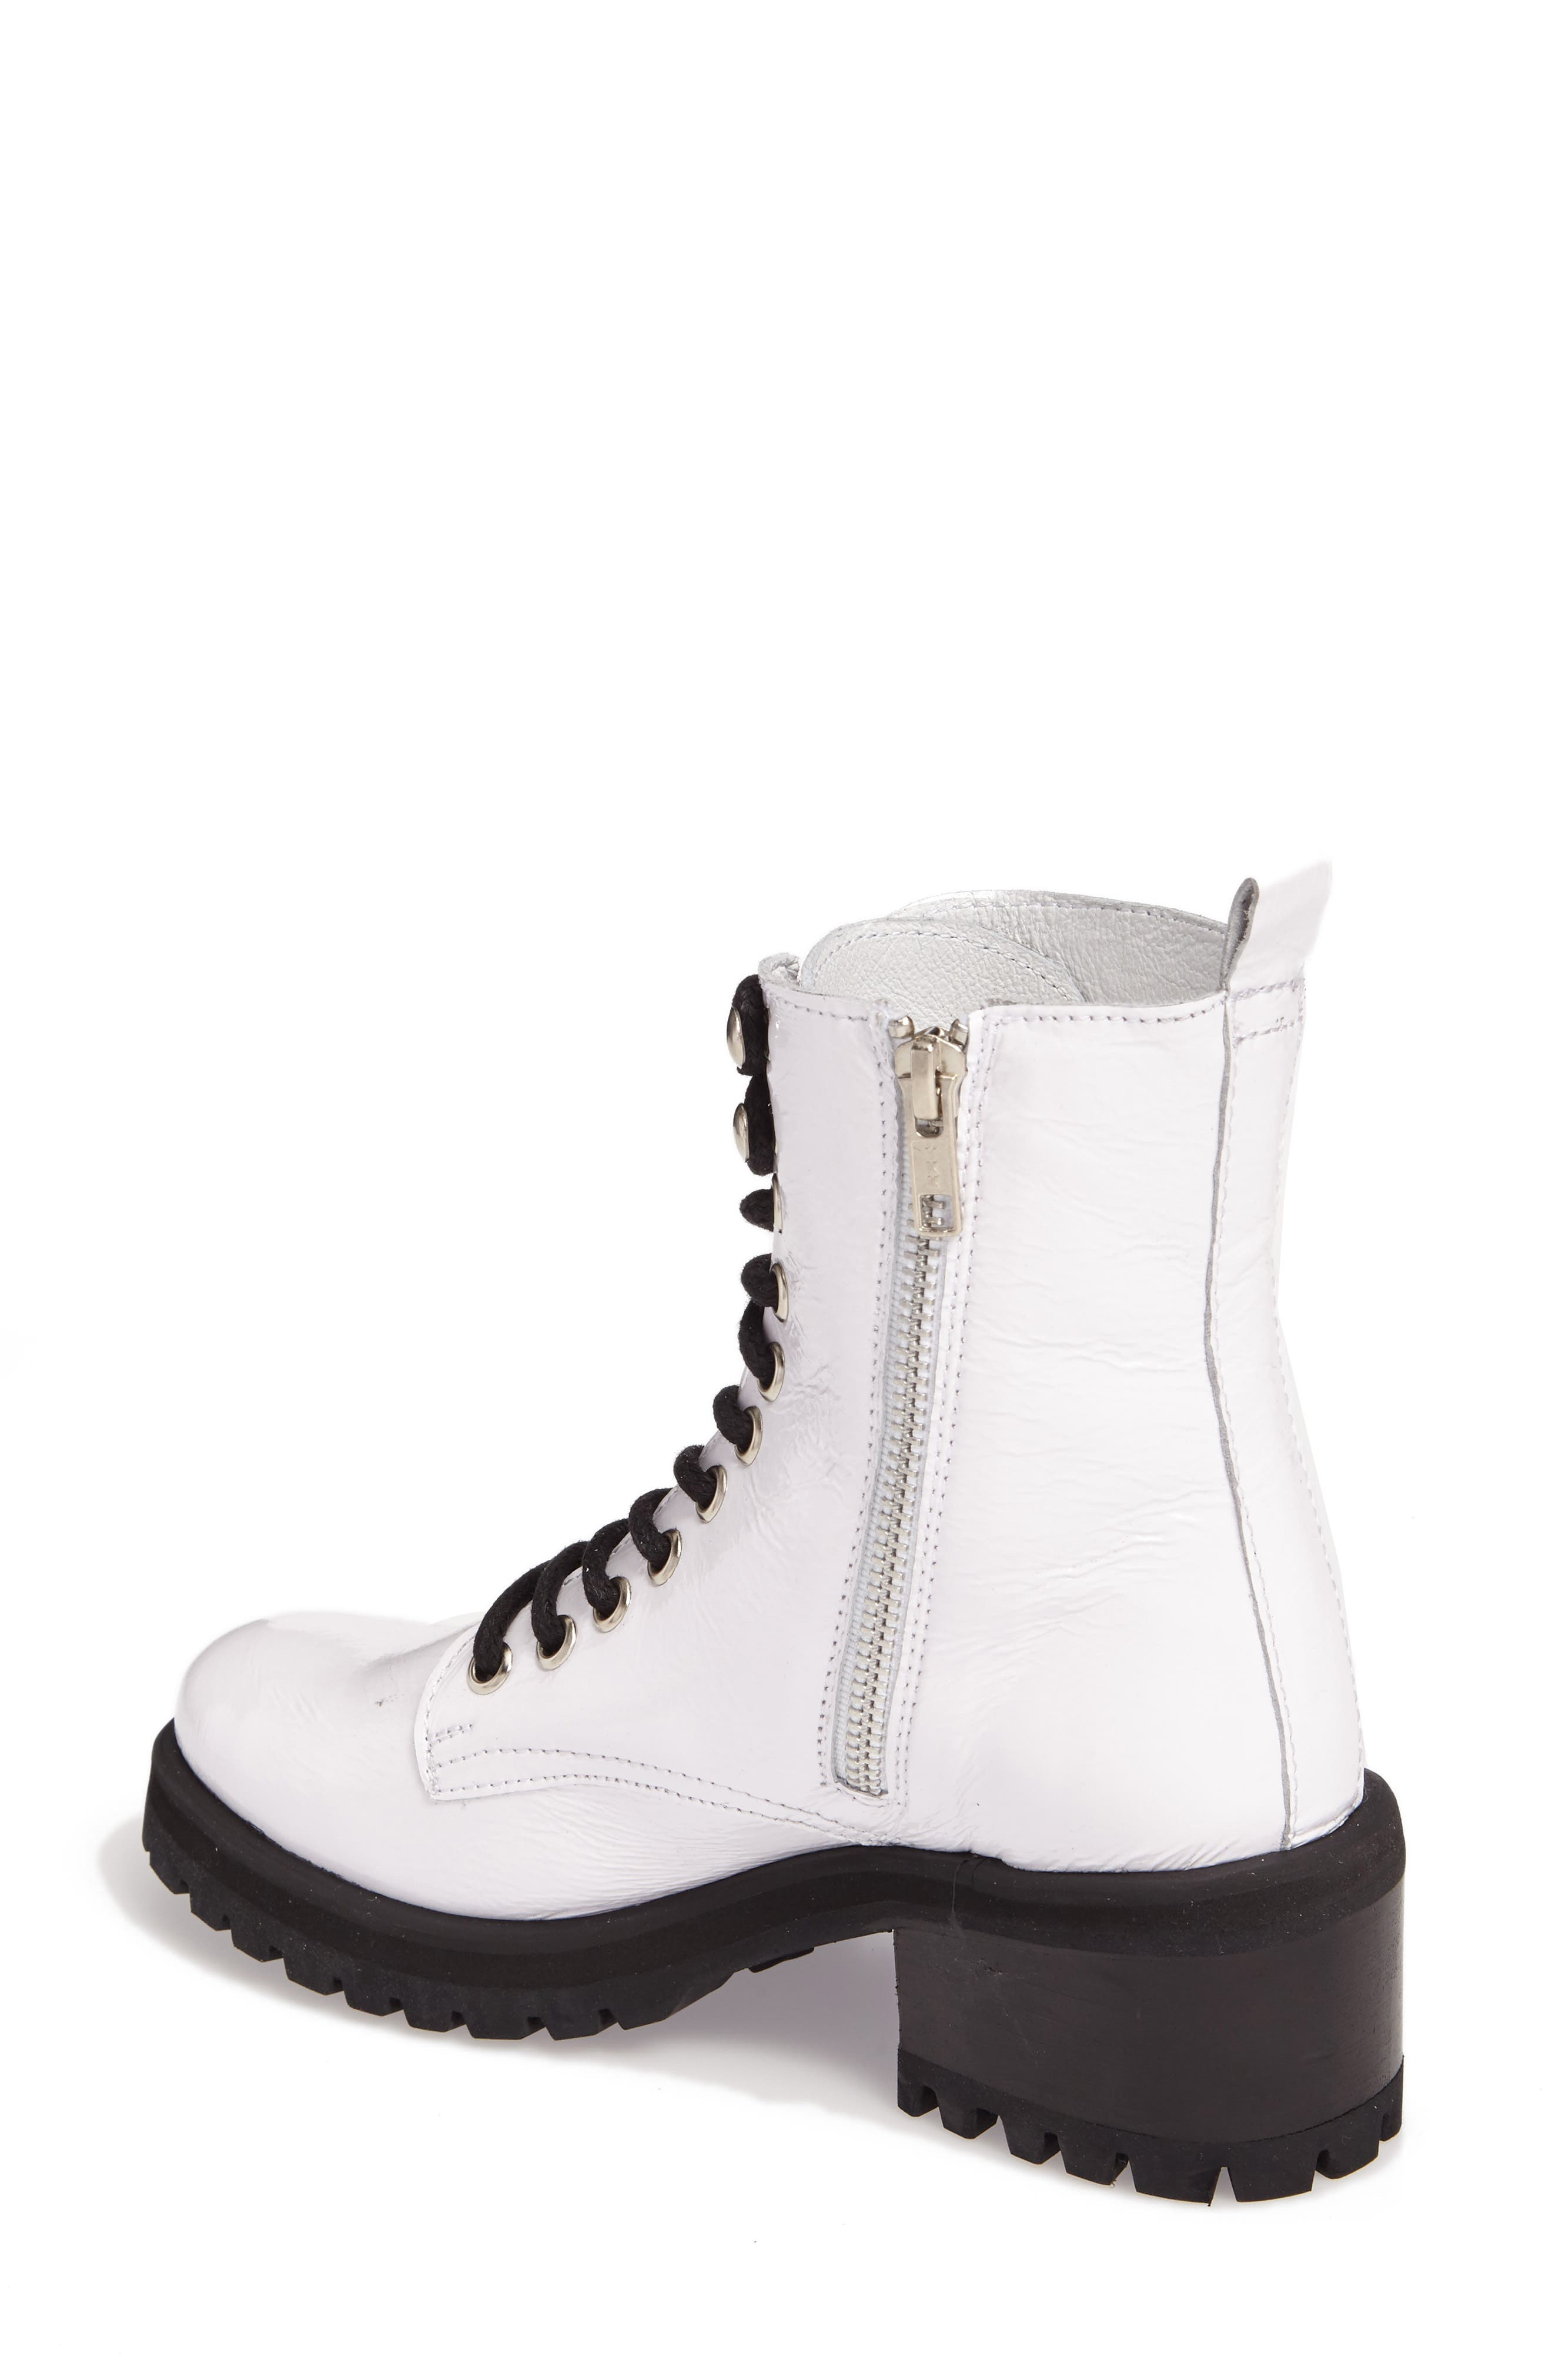 Geneva Bootie,                             Alternate thumbnail 2, color,                             White Patent Leather